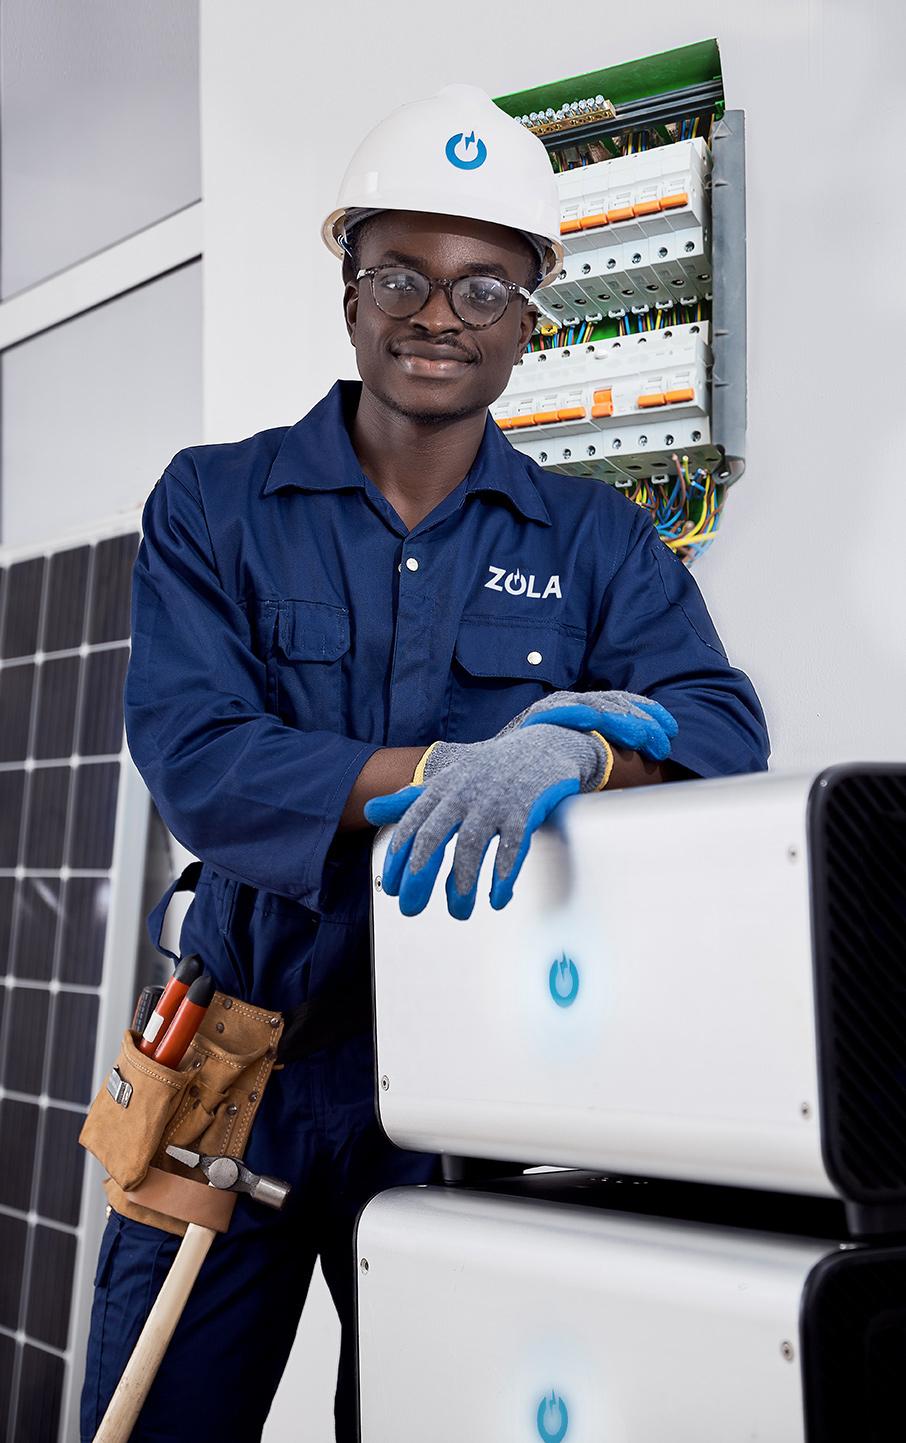 ZOLA-Electric-INFINITY-Africa-Nigeria-Lagos-Urban-TechOp-Installation-done-Zola-1.jpg